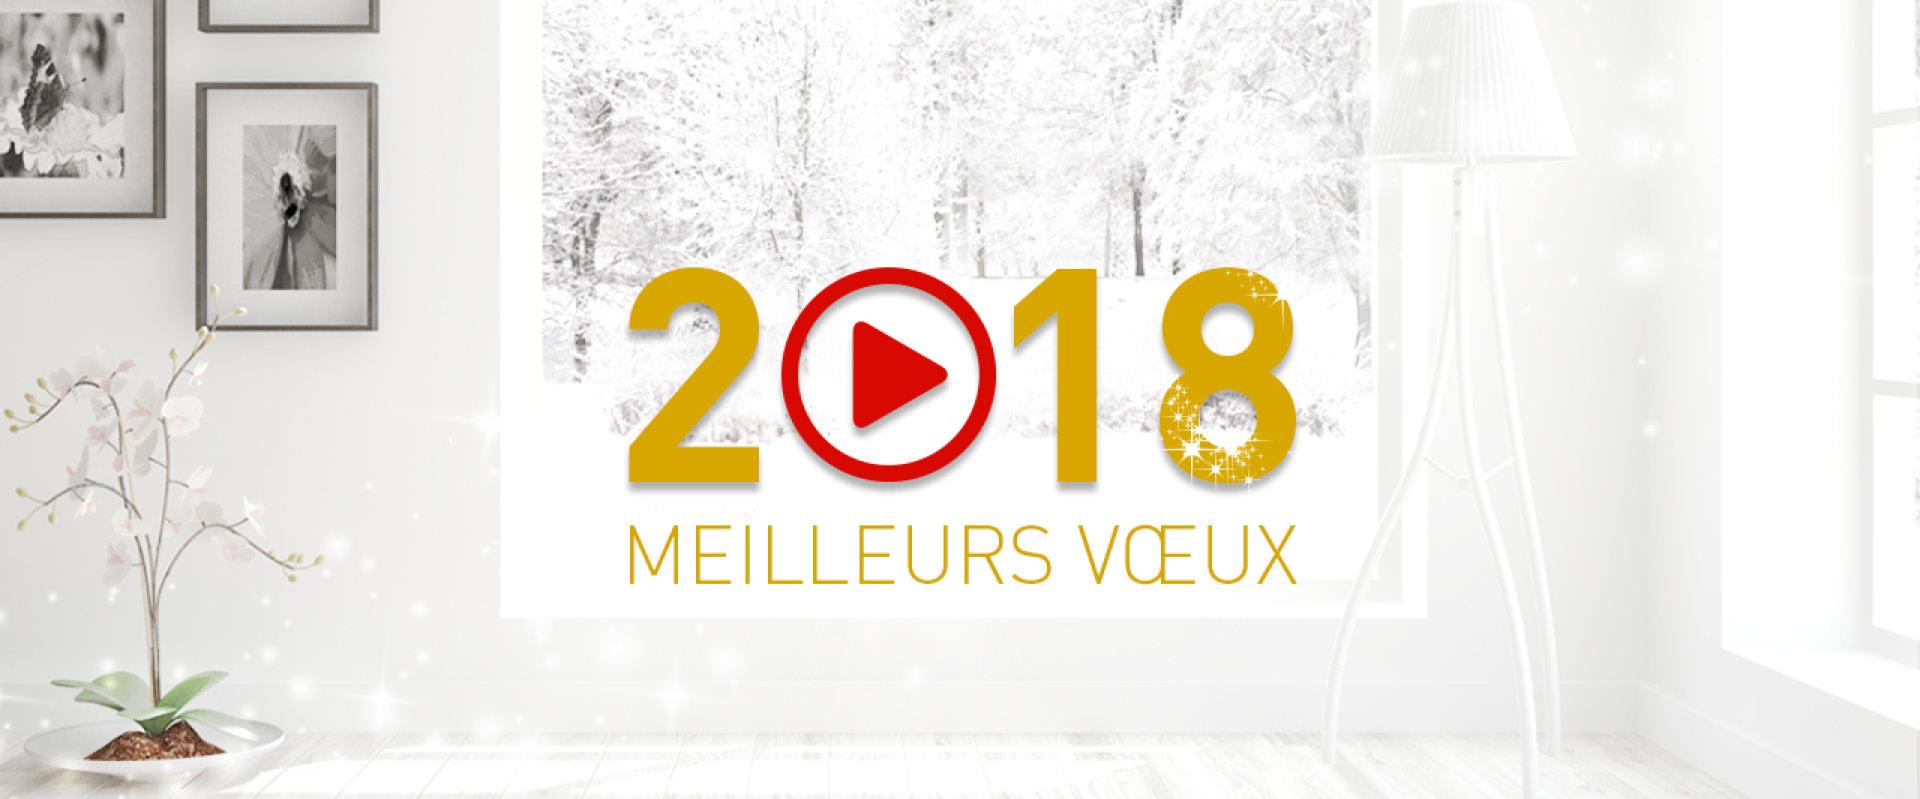 Voeux 2018